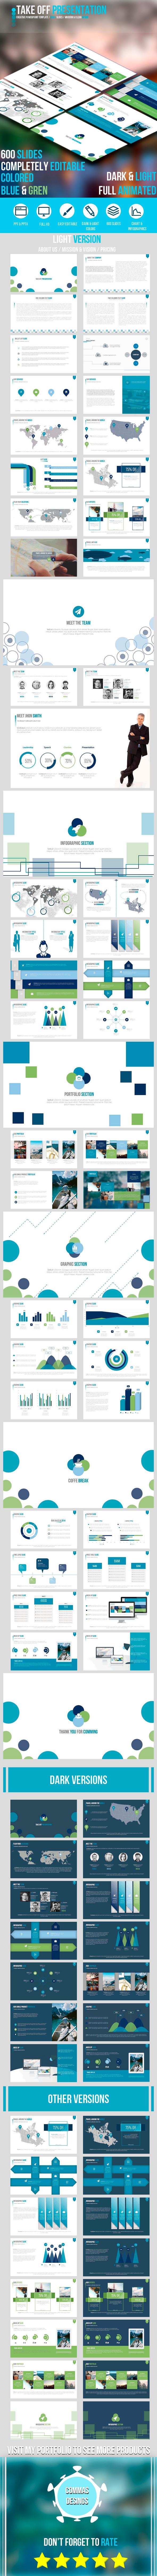 Take Off Presentation - PowerPoint Templates Presentation Templates